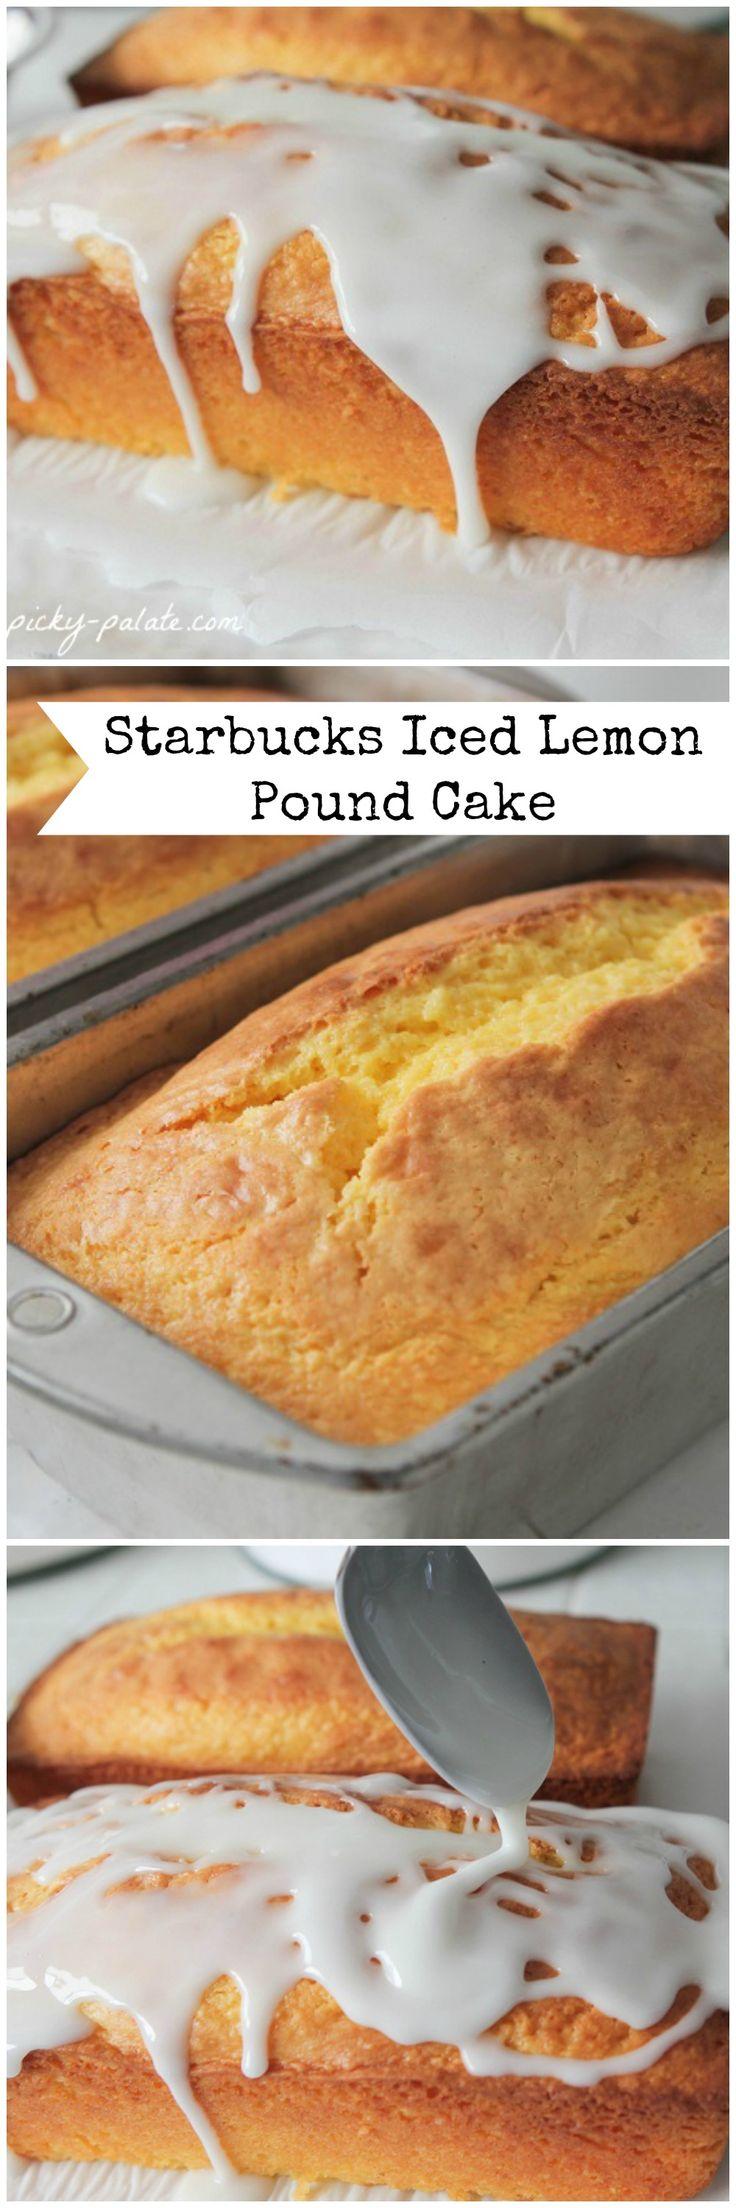 Starbucks Iced Lemon Pound Cake Copycat Recipe!